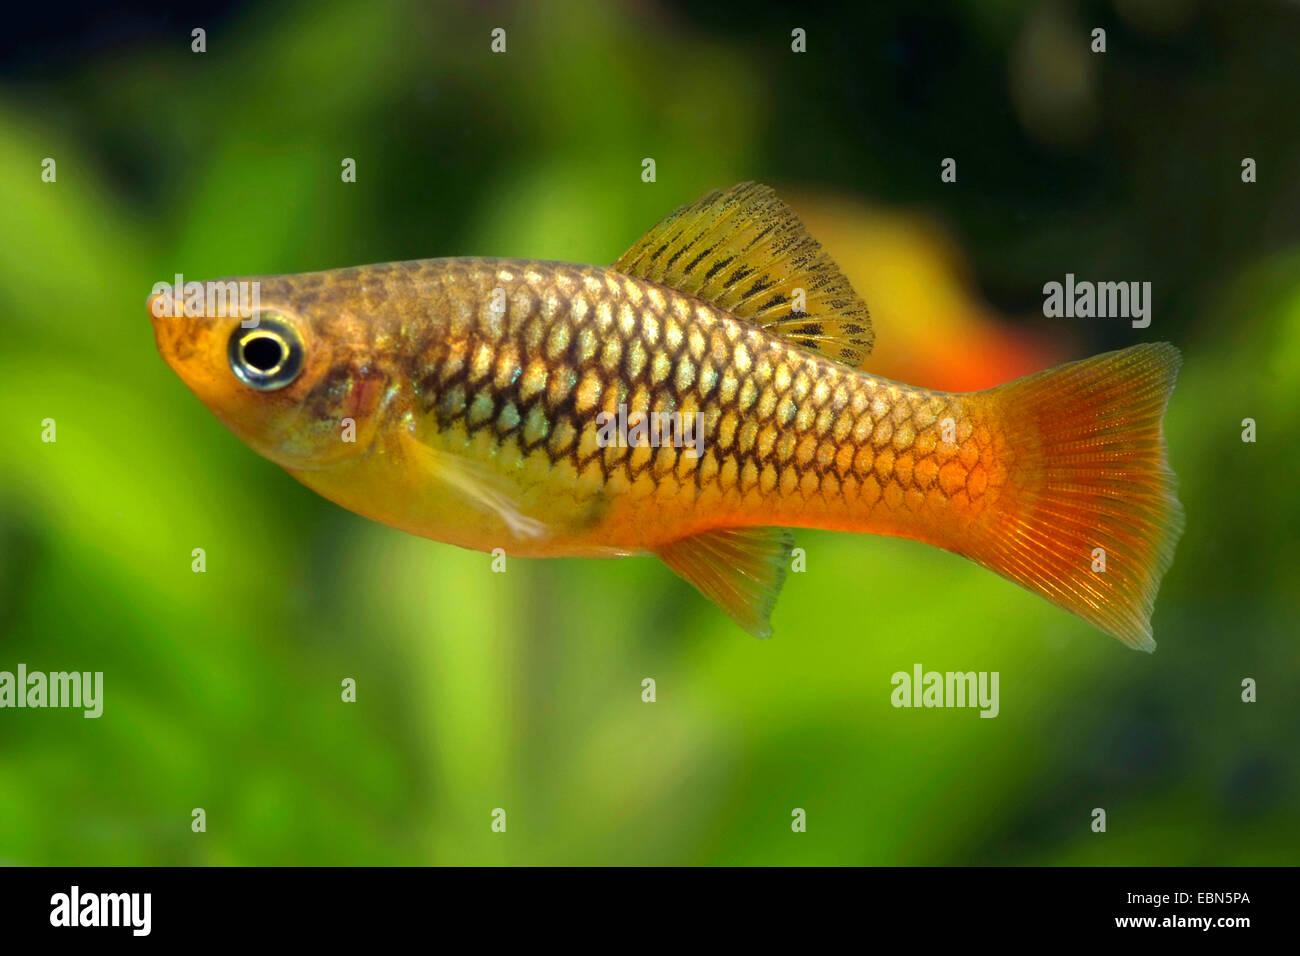 Variegata di platy, Variatus swordtail, Variable platyfish, Parrot Platy (Xiphophorus variatus), nuoto Immagini Stock